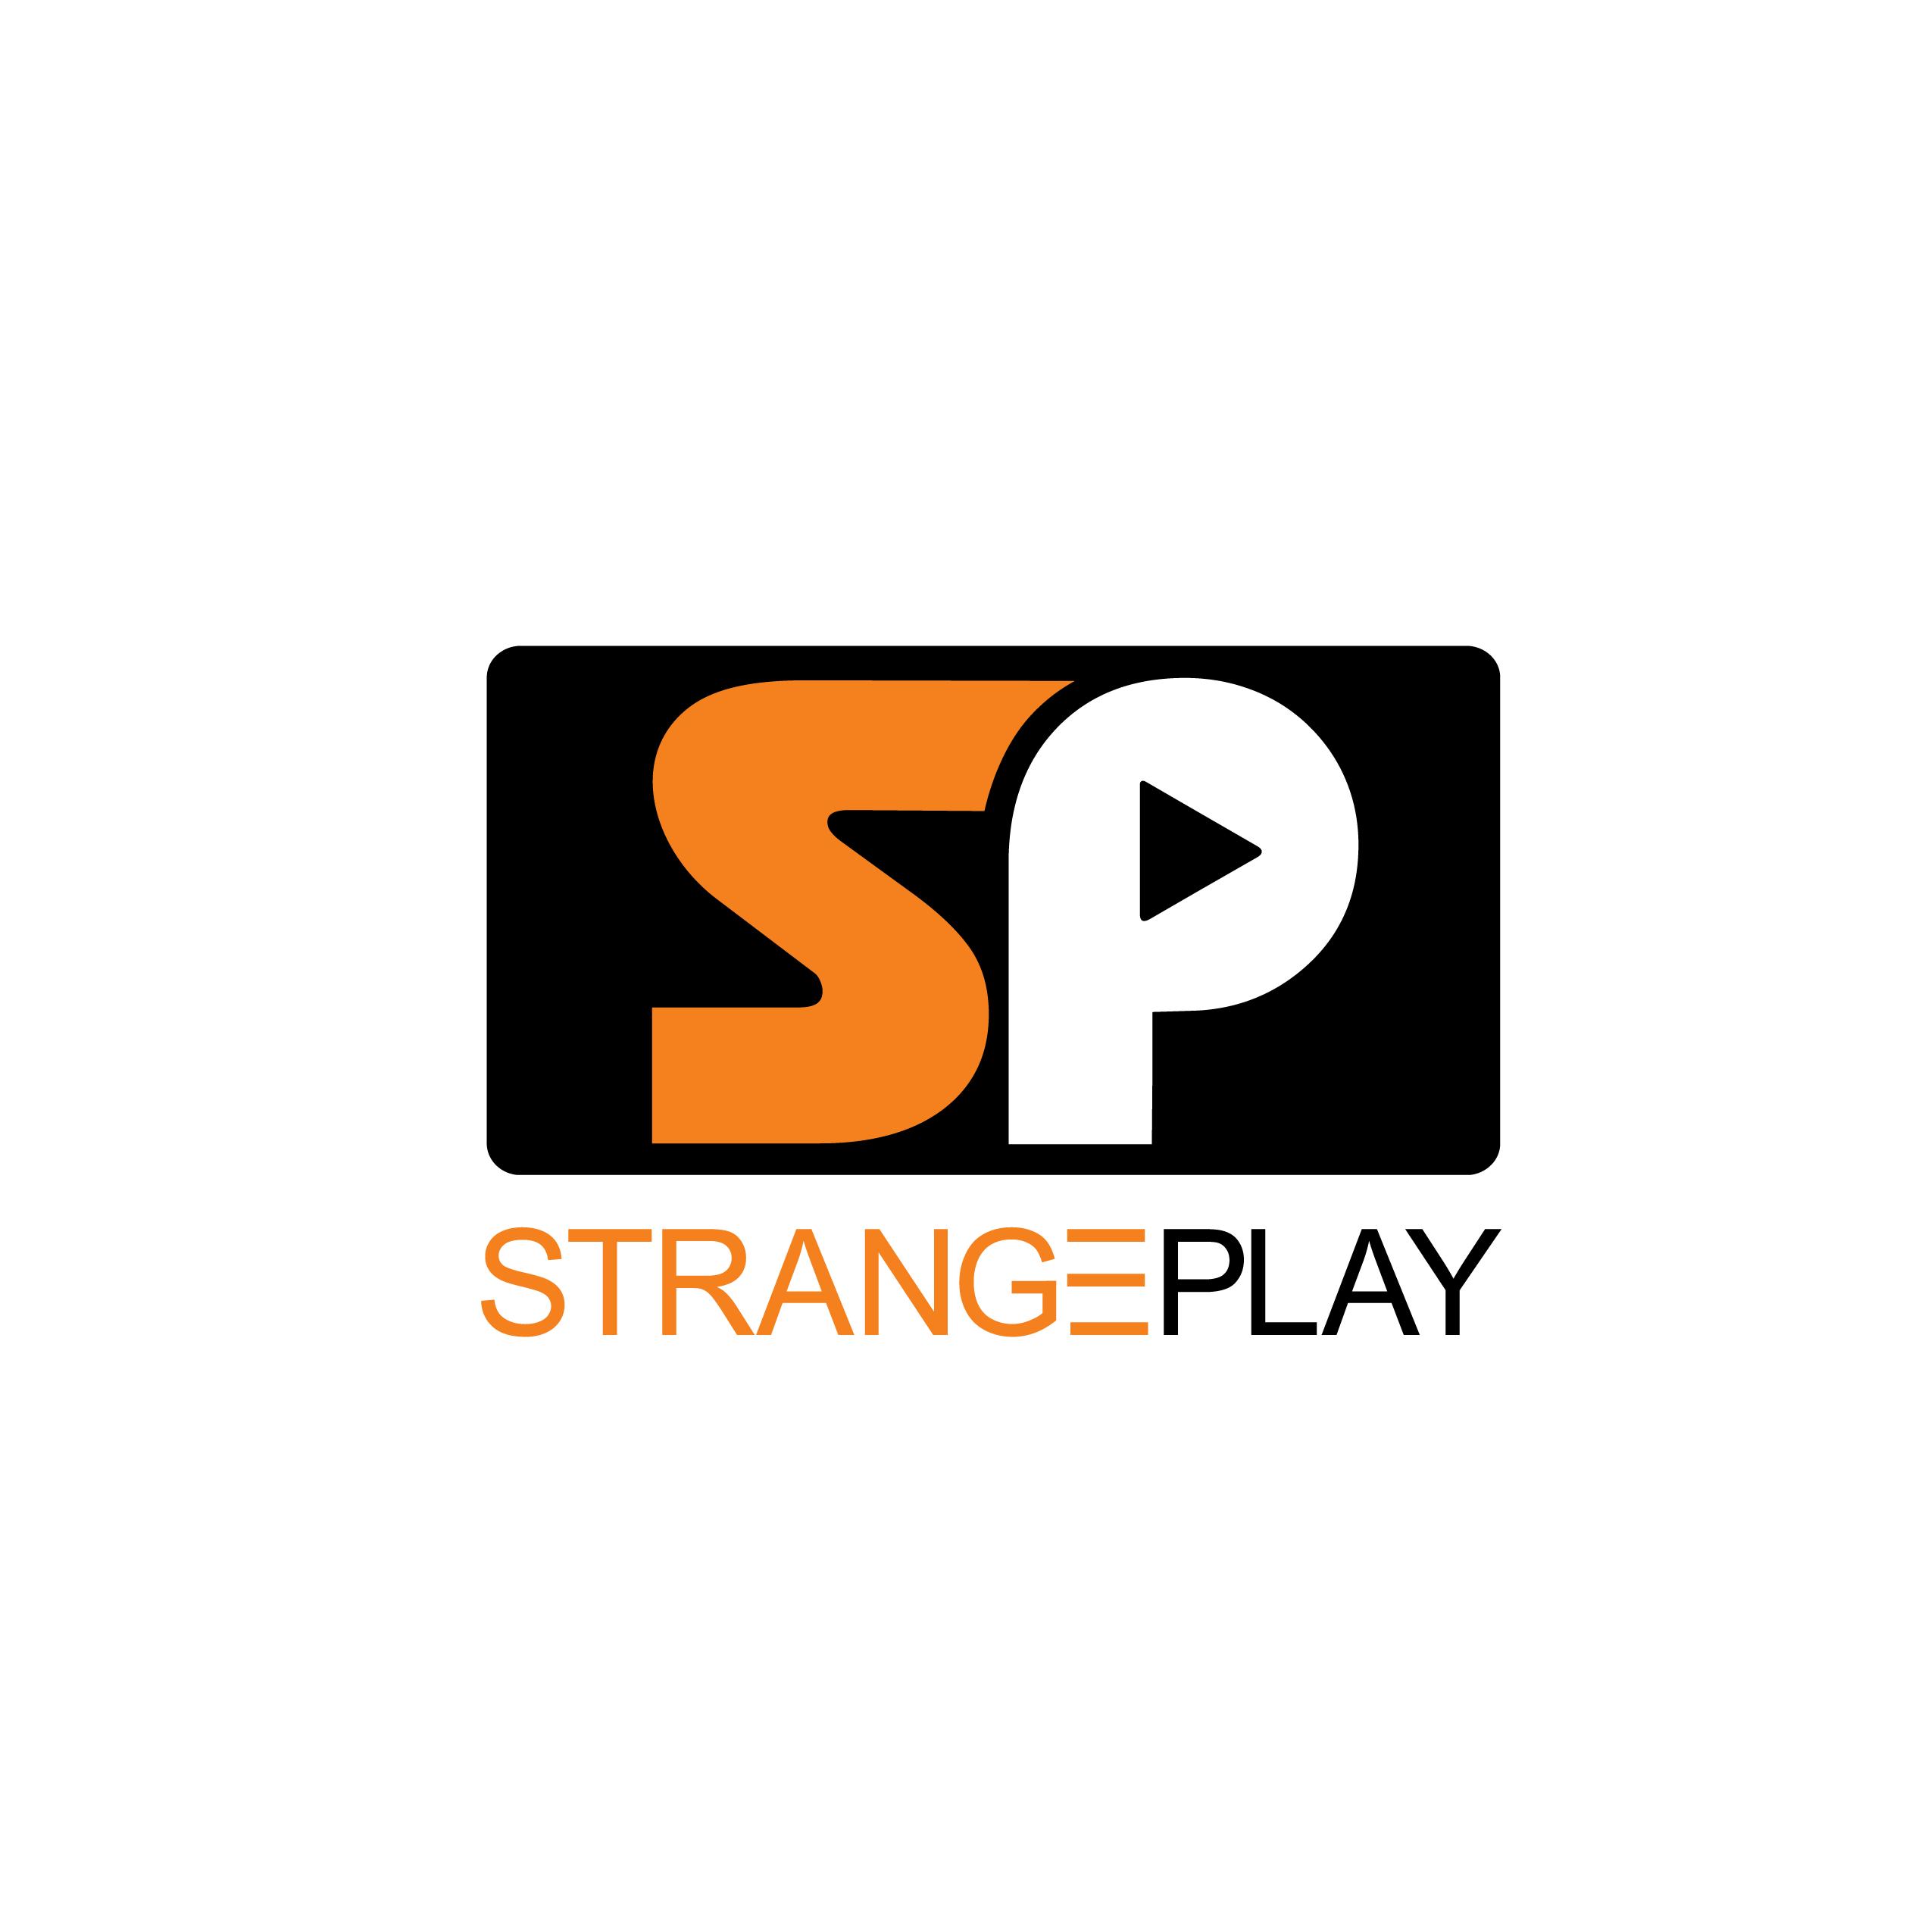 Logo Design by xpert - Entry No. 86 in the Logo Design Contest Strange Play Logo Design.